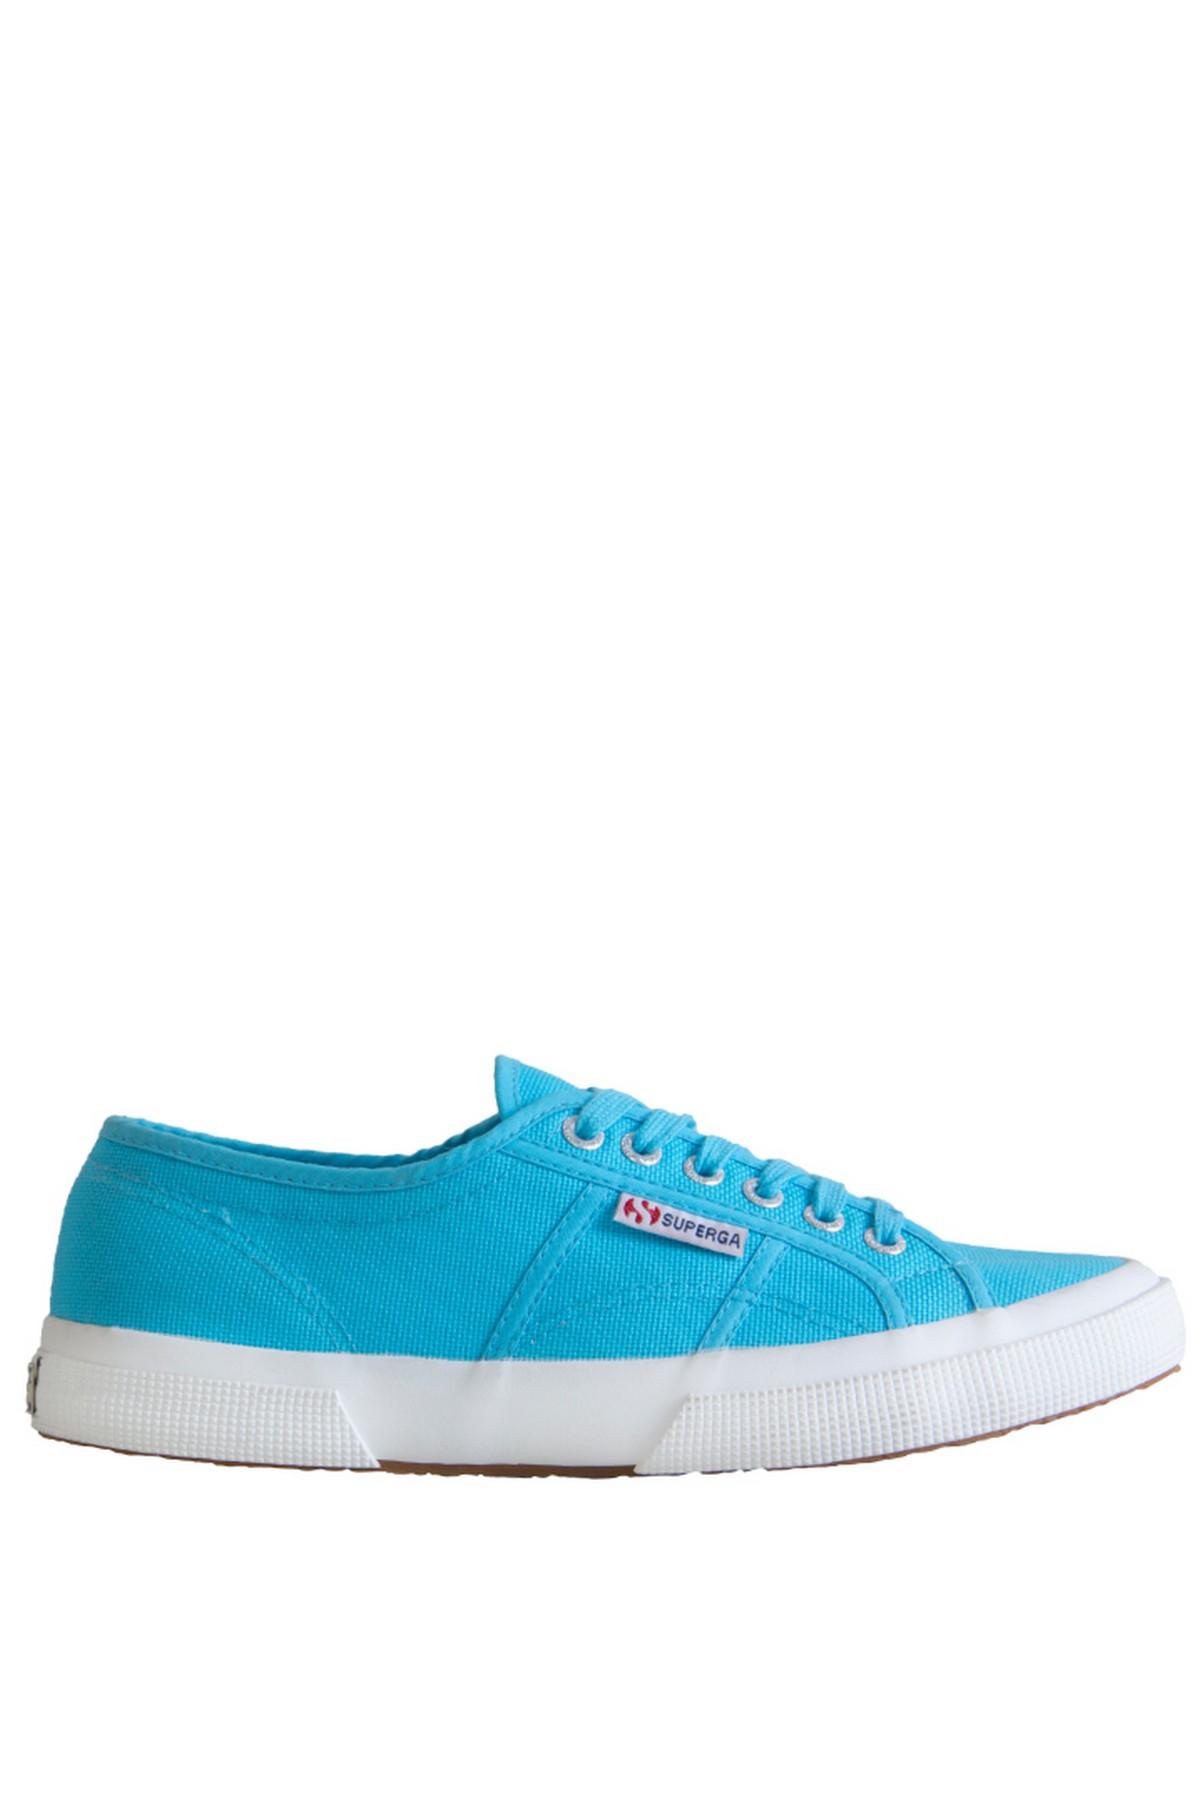 Superga Ayakkabı 2750 - Cotu Classic Açık Mavi Renk (S000010-C52)